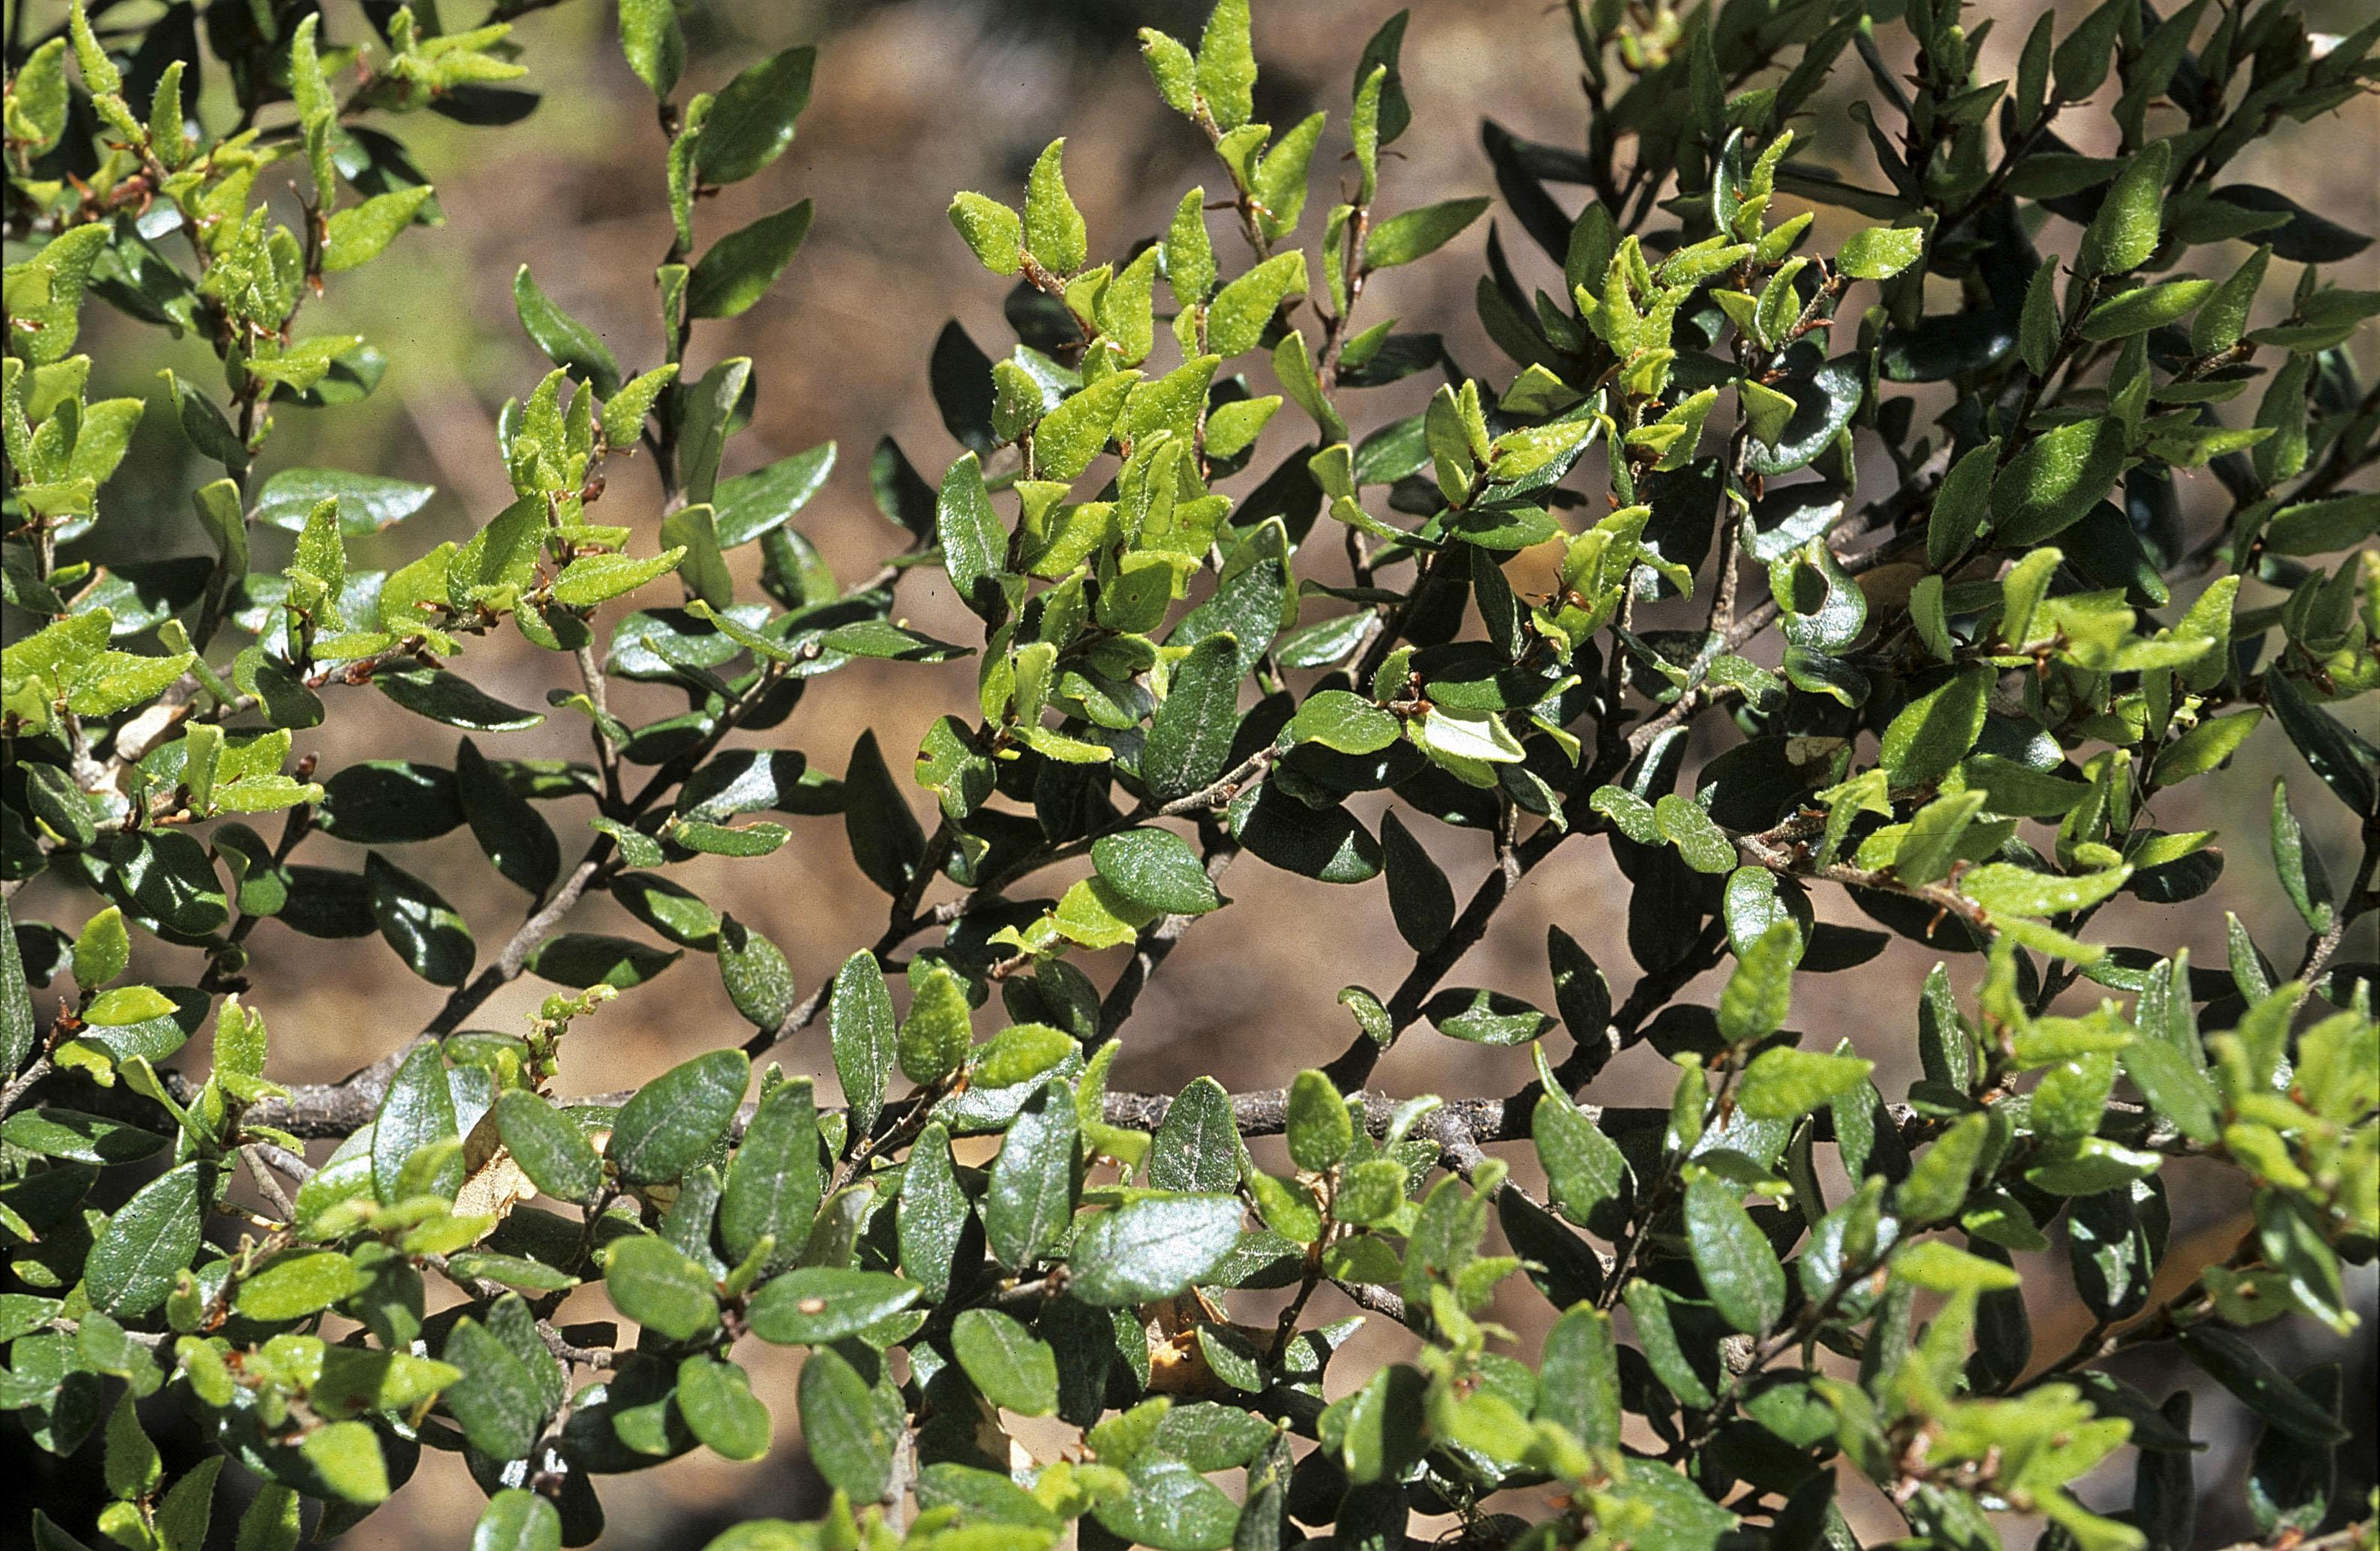 Nothofagus solandri var. cliffortoides